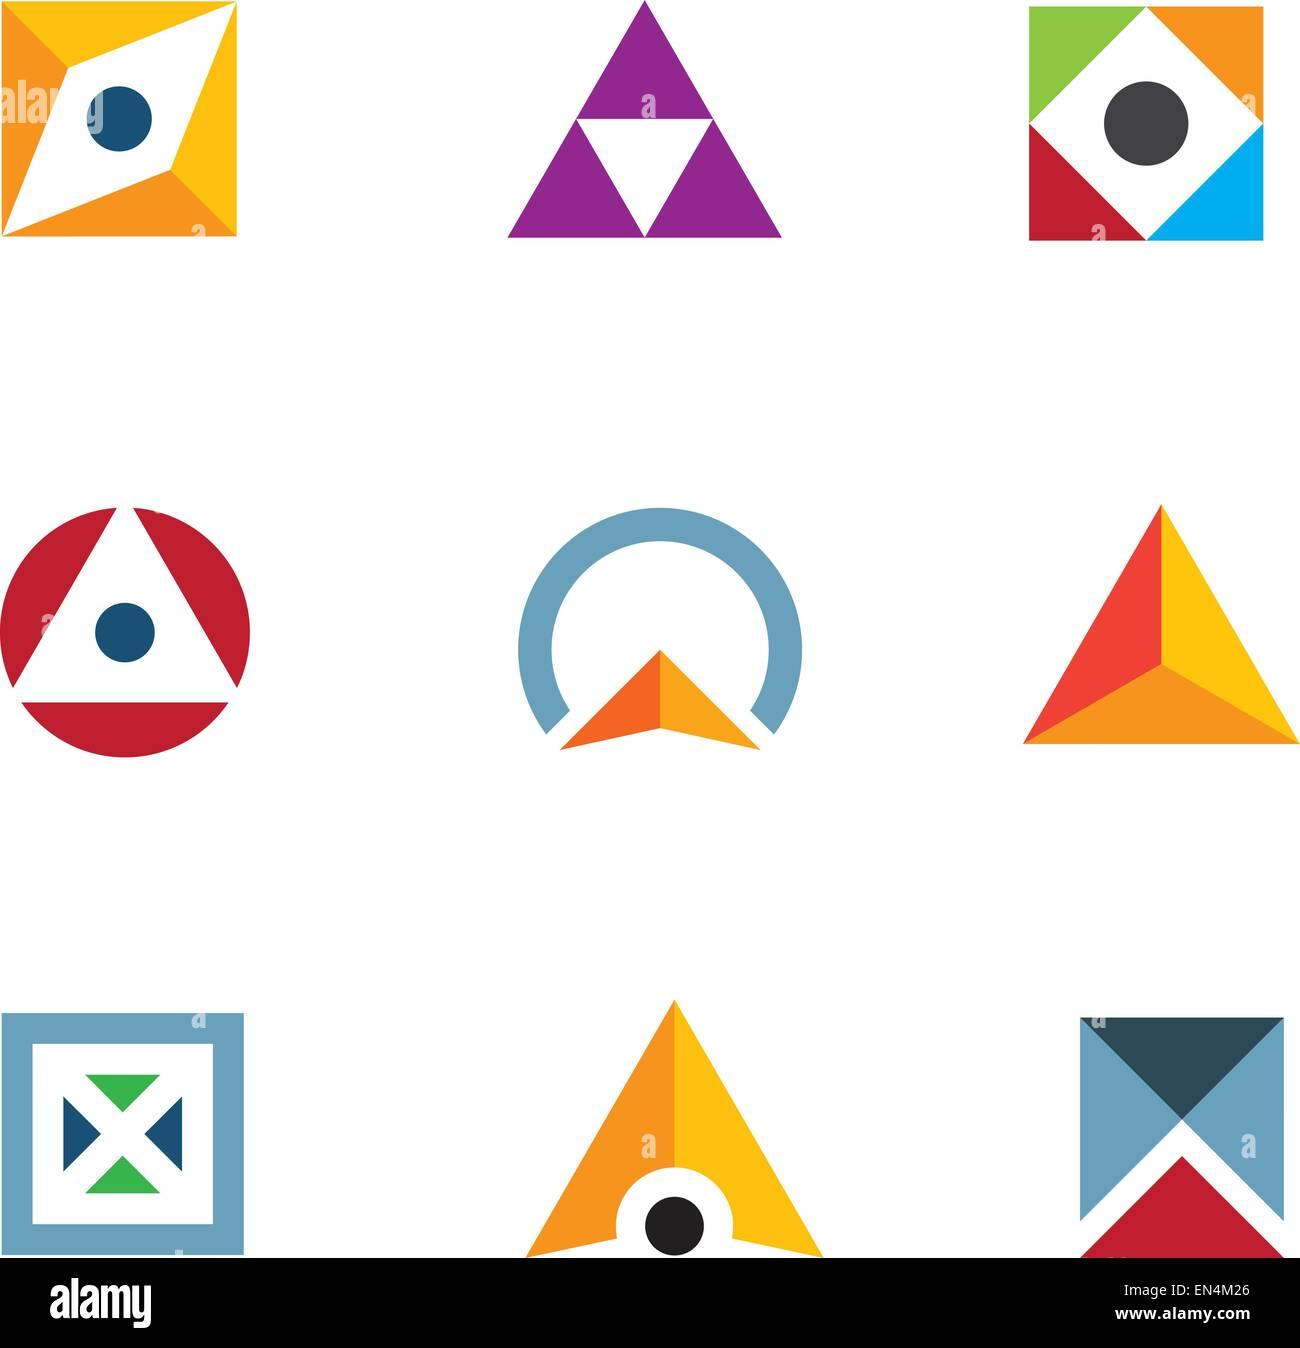 Geometric shape triangle circle and cube inspiring combination geometric shape triangle circle and cube inspiring combination logo icon buycottarizona